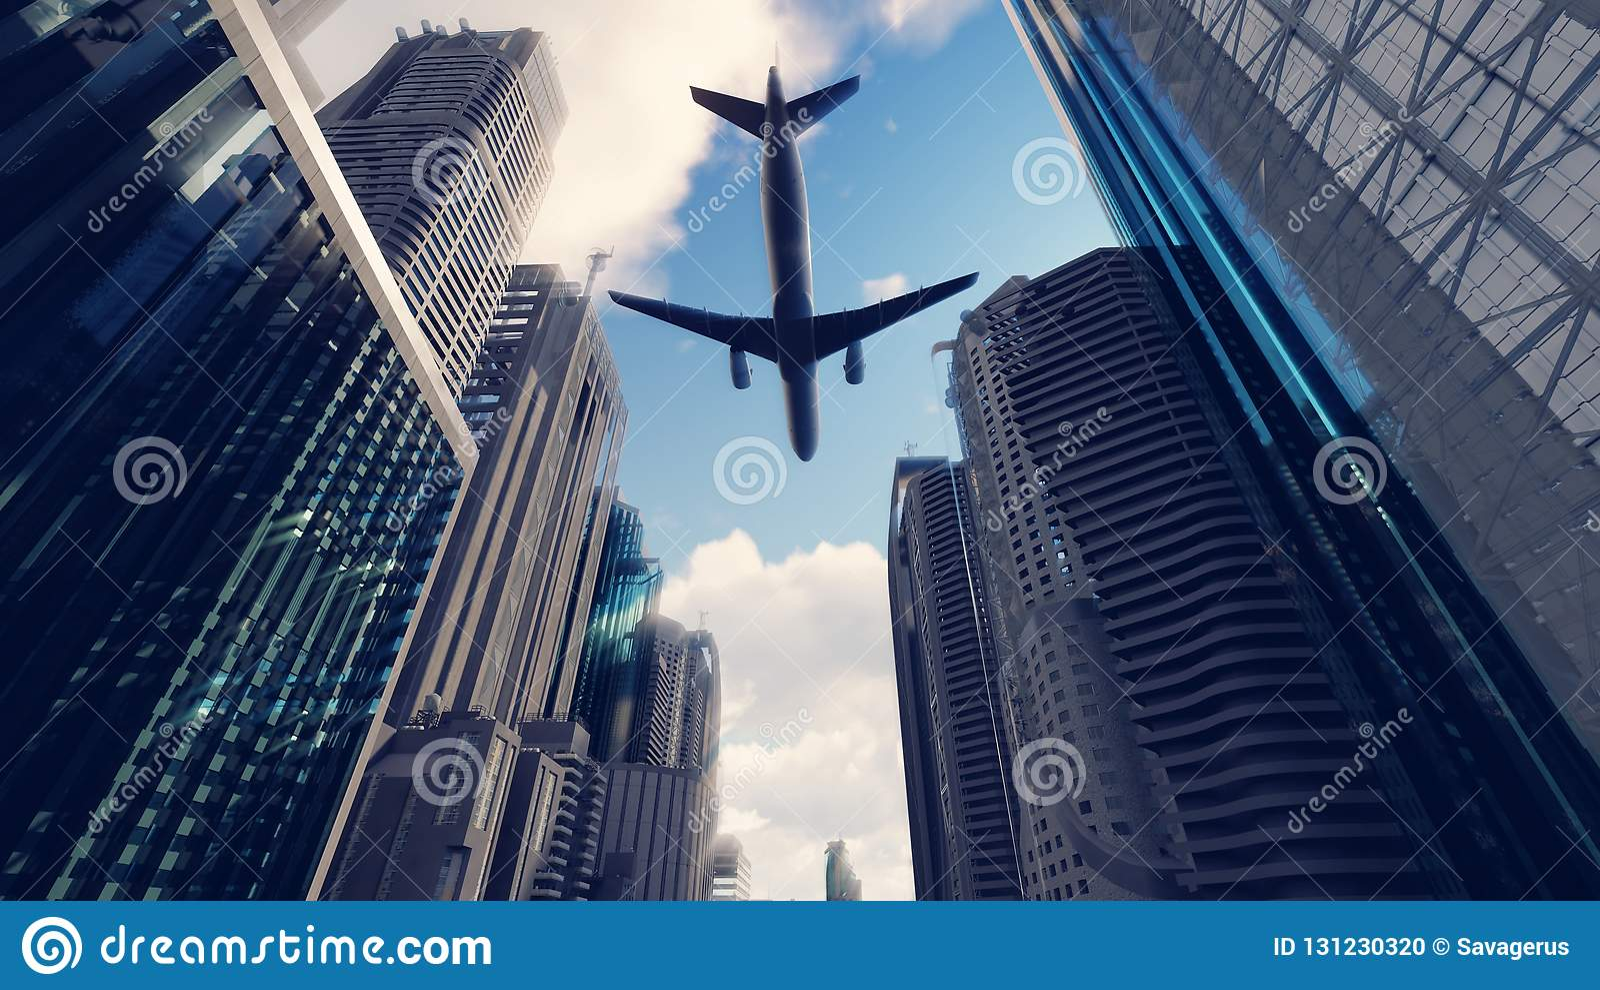 A passenger plane flies over a modern megapolis at sunrise. 3D Rendering